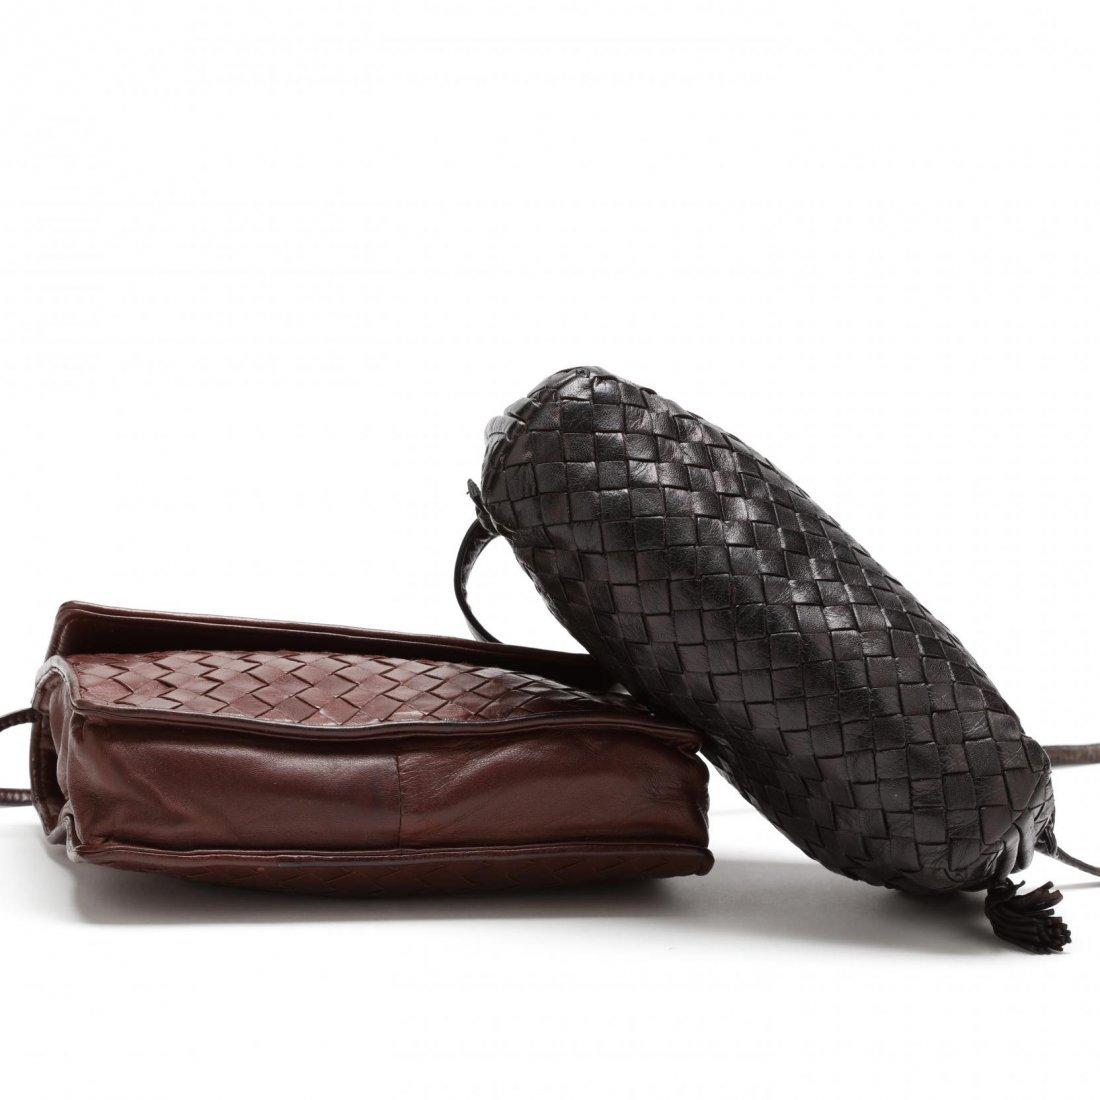 Two Cross-body Bags, Bottega Veneta - 3